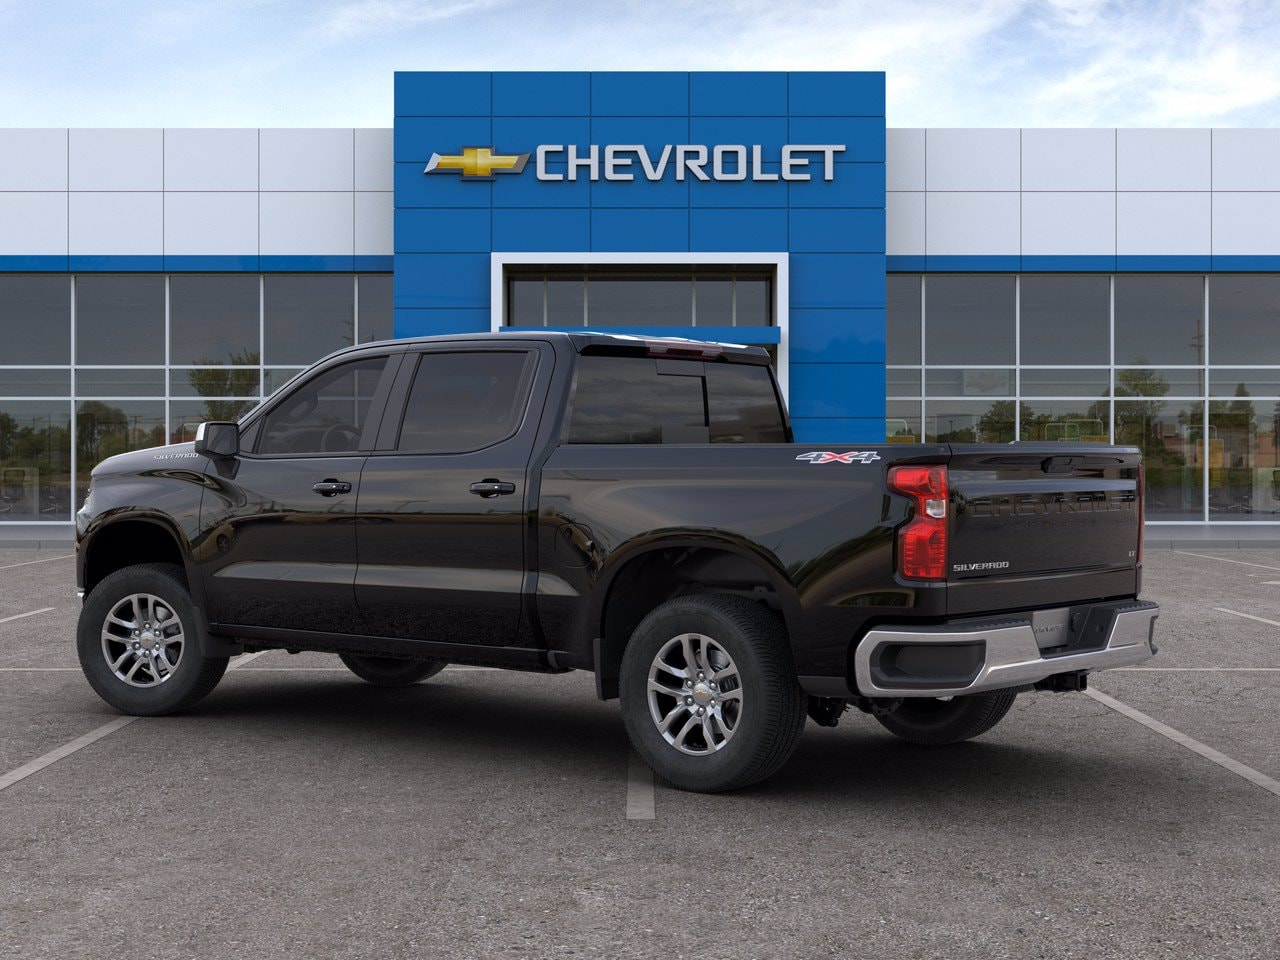 2020 Chevrolet Silverado 1500 Crew Cab 4x4, Pickup #C201419 - photo 4